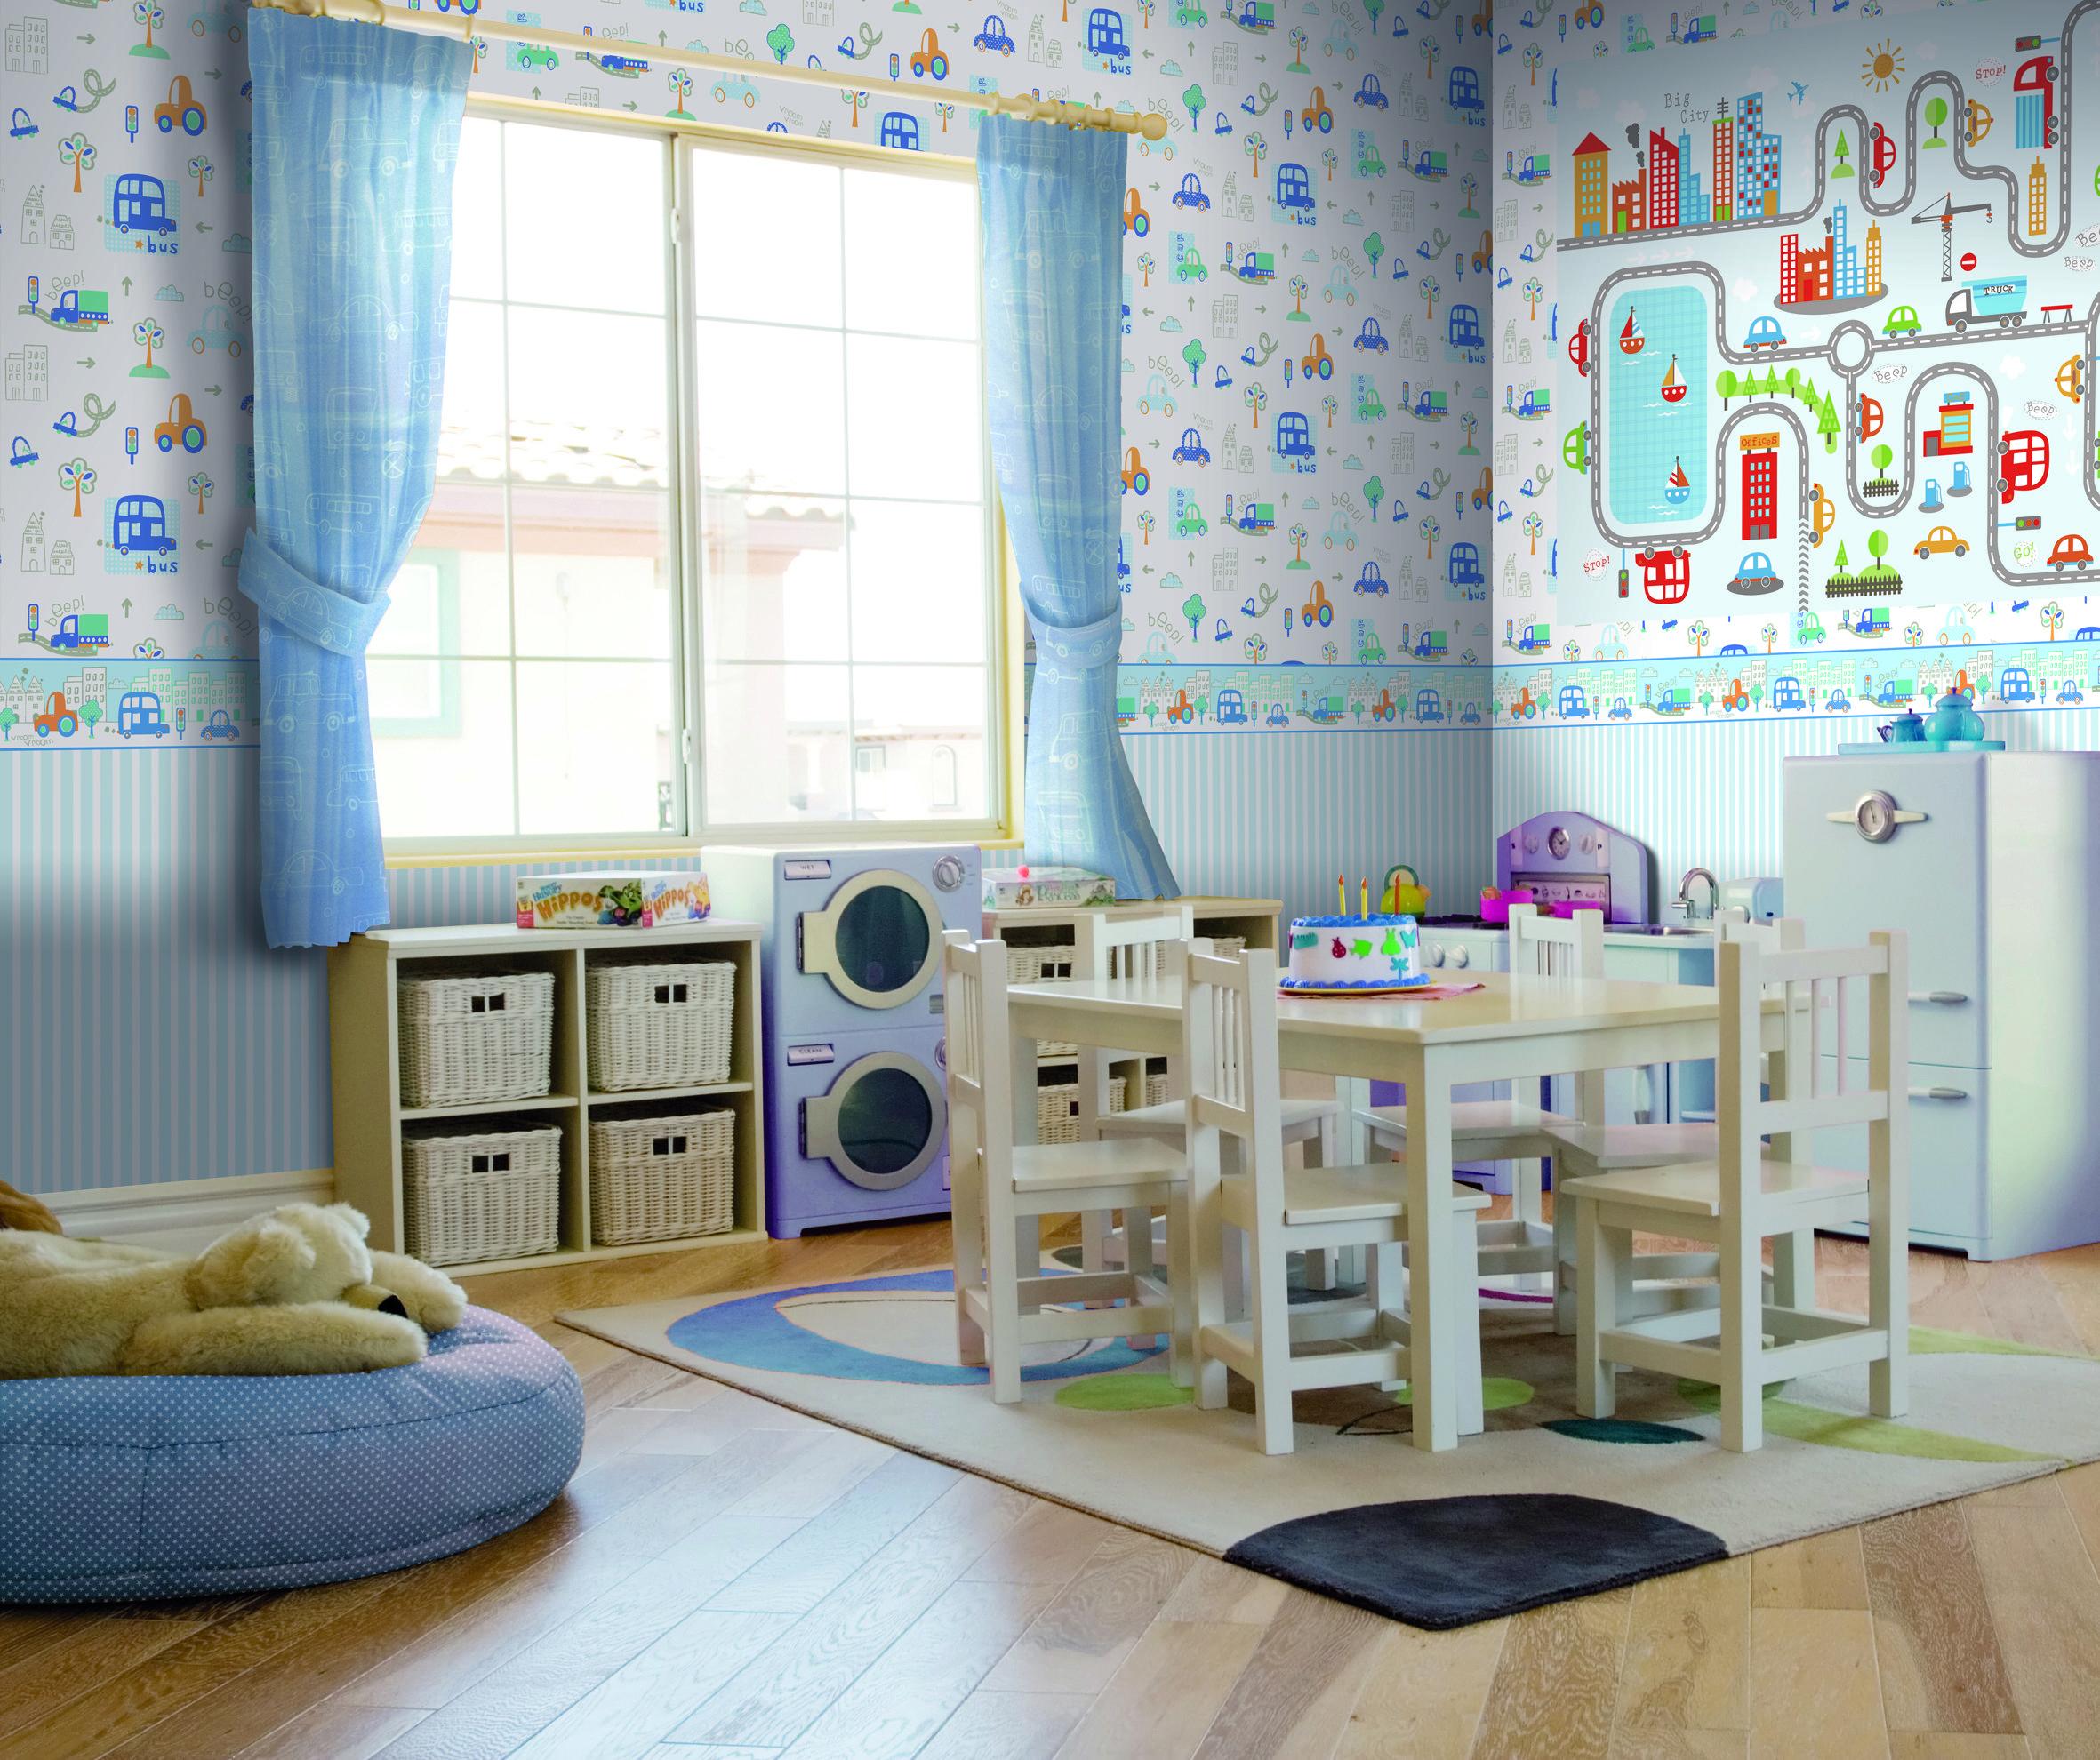 Pin De Colomural En Colomural Coconet Pinterest ~ Papel Para Habitaciones Infantiles